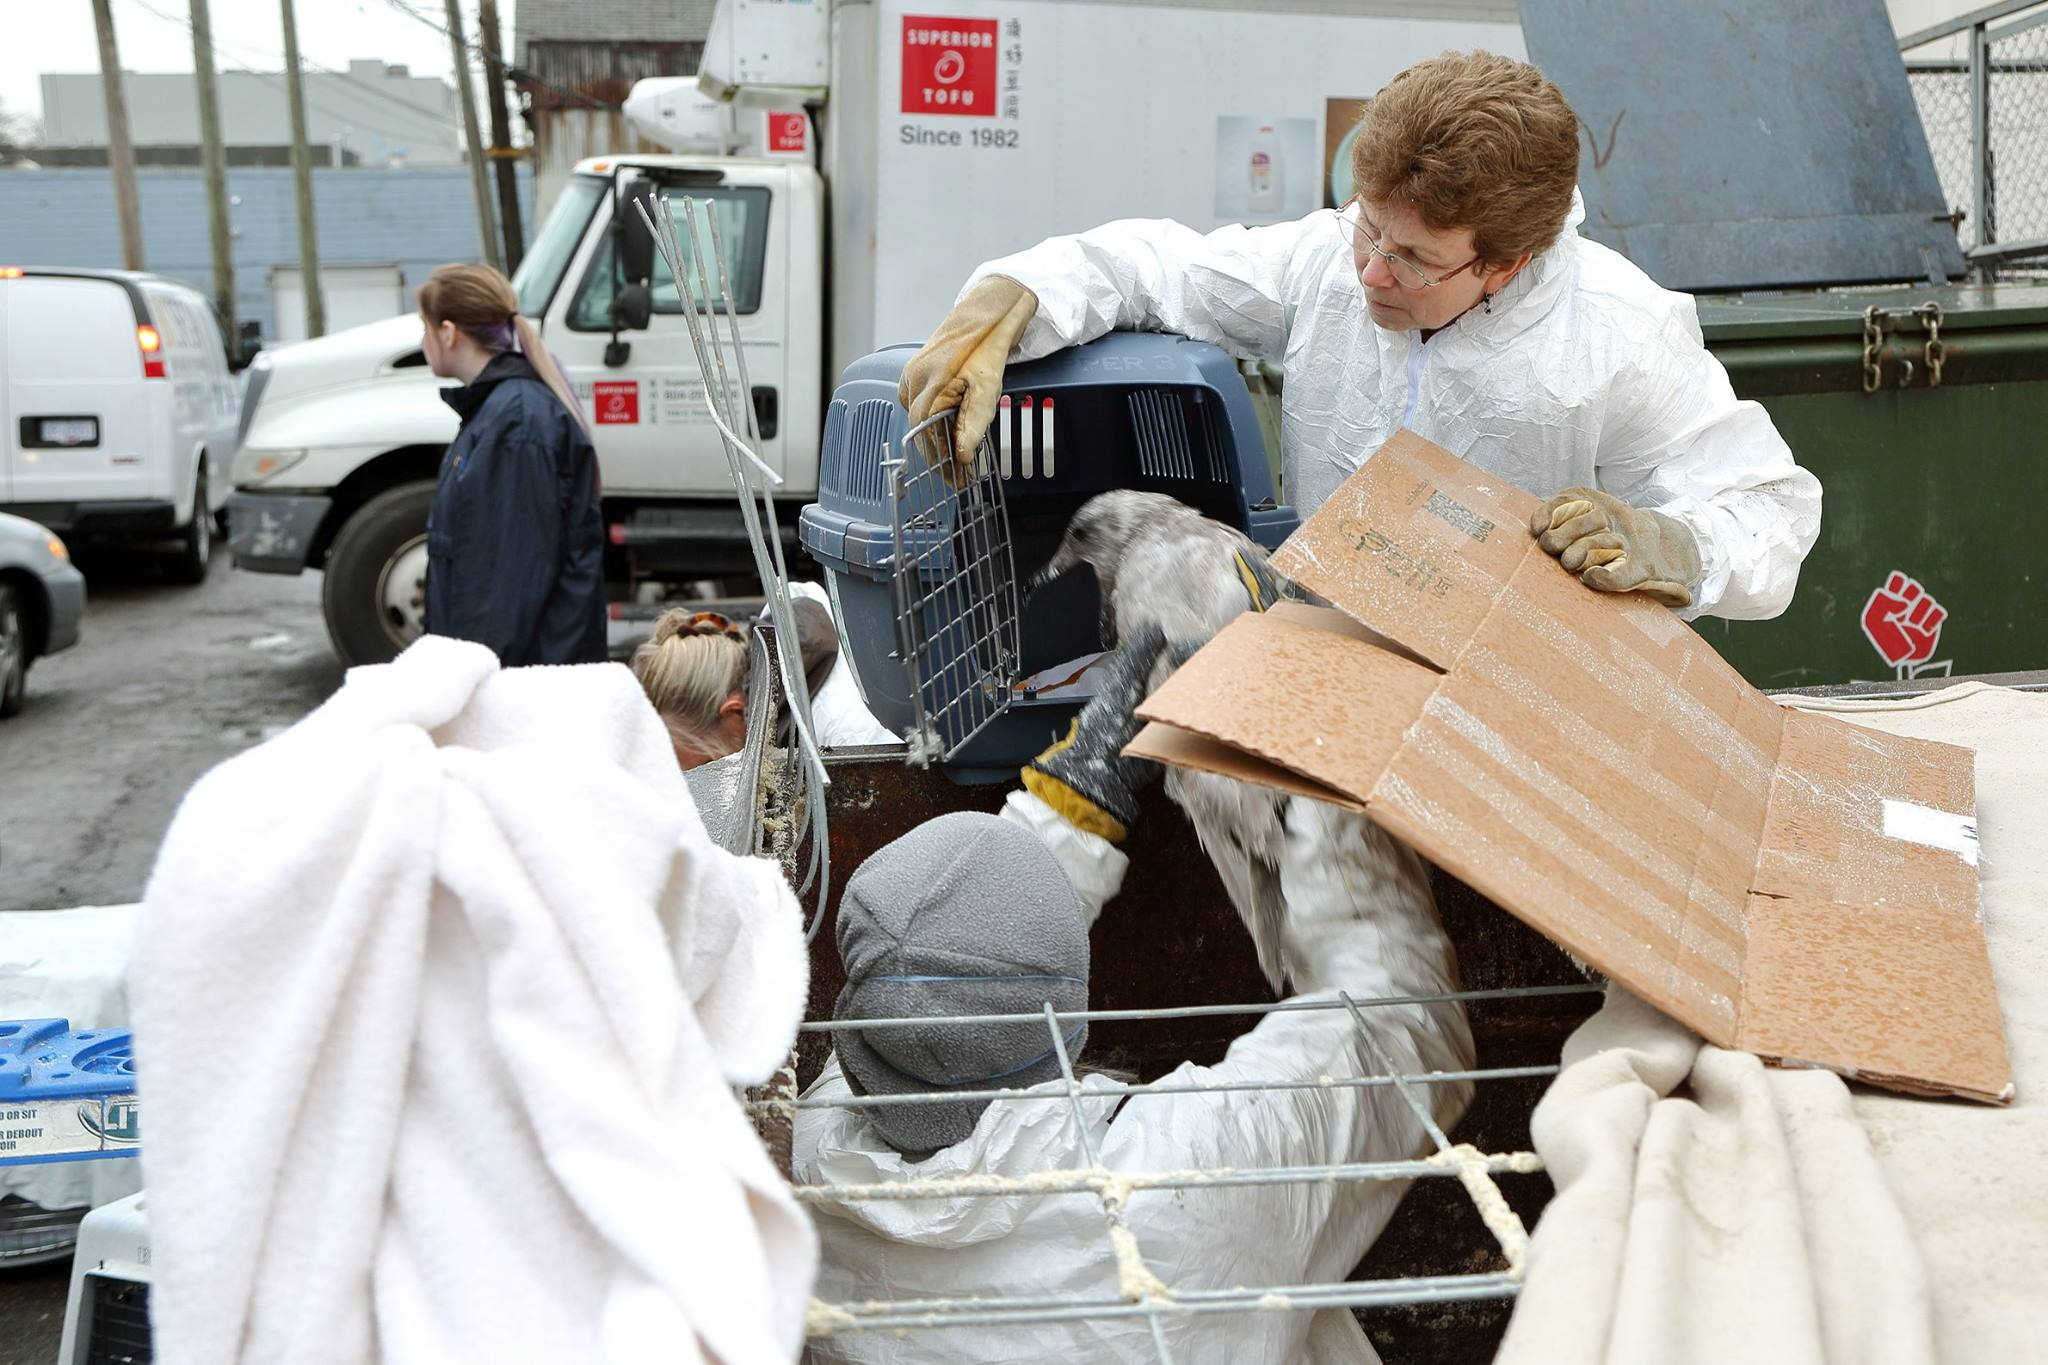 Image: Wildlife Rescue Association of B.C.